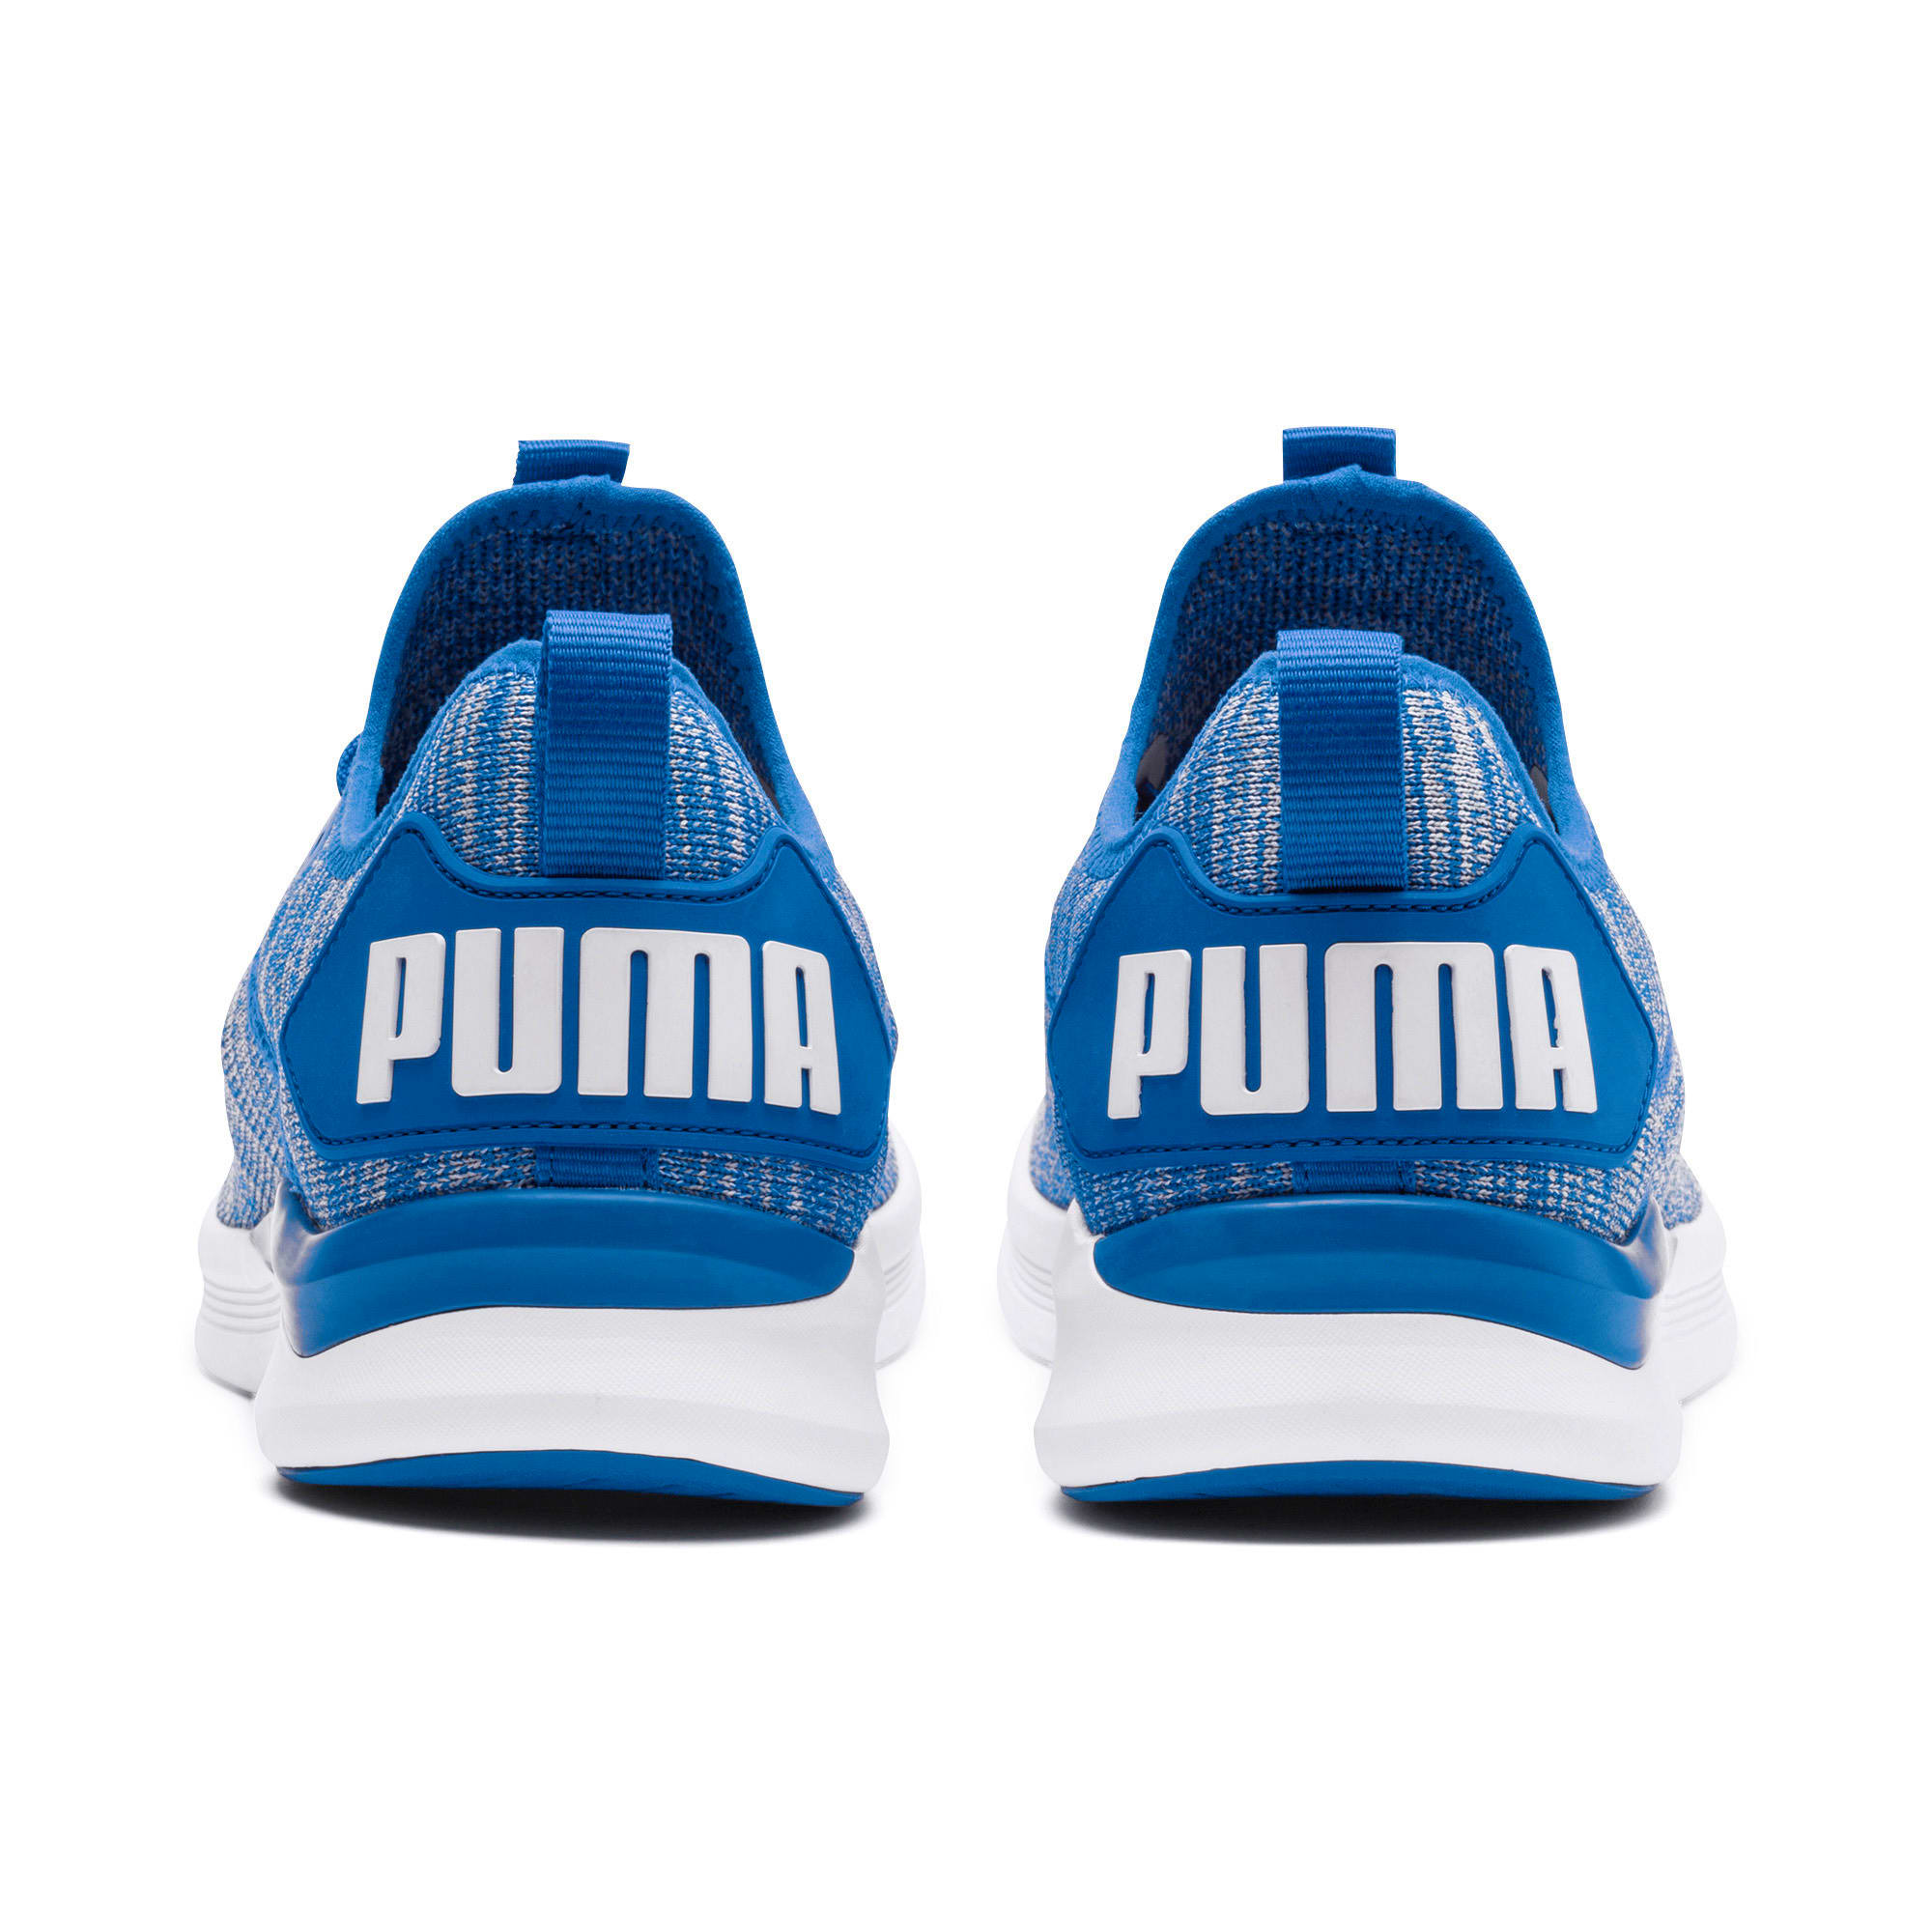 Thumbnail 4 of IGNITE Flash evoKNIT Men's Training Shoes, Strong Blue-White, medium